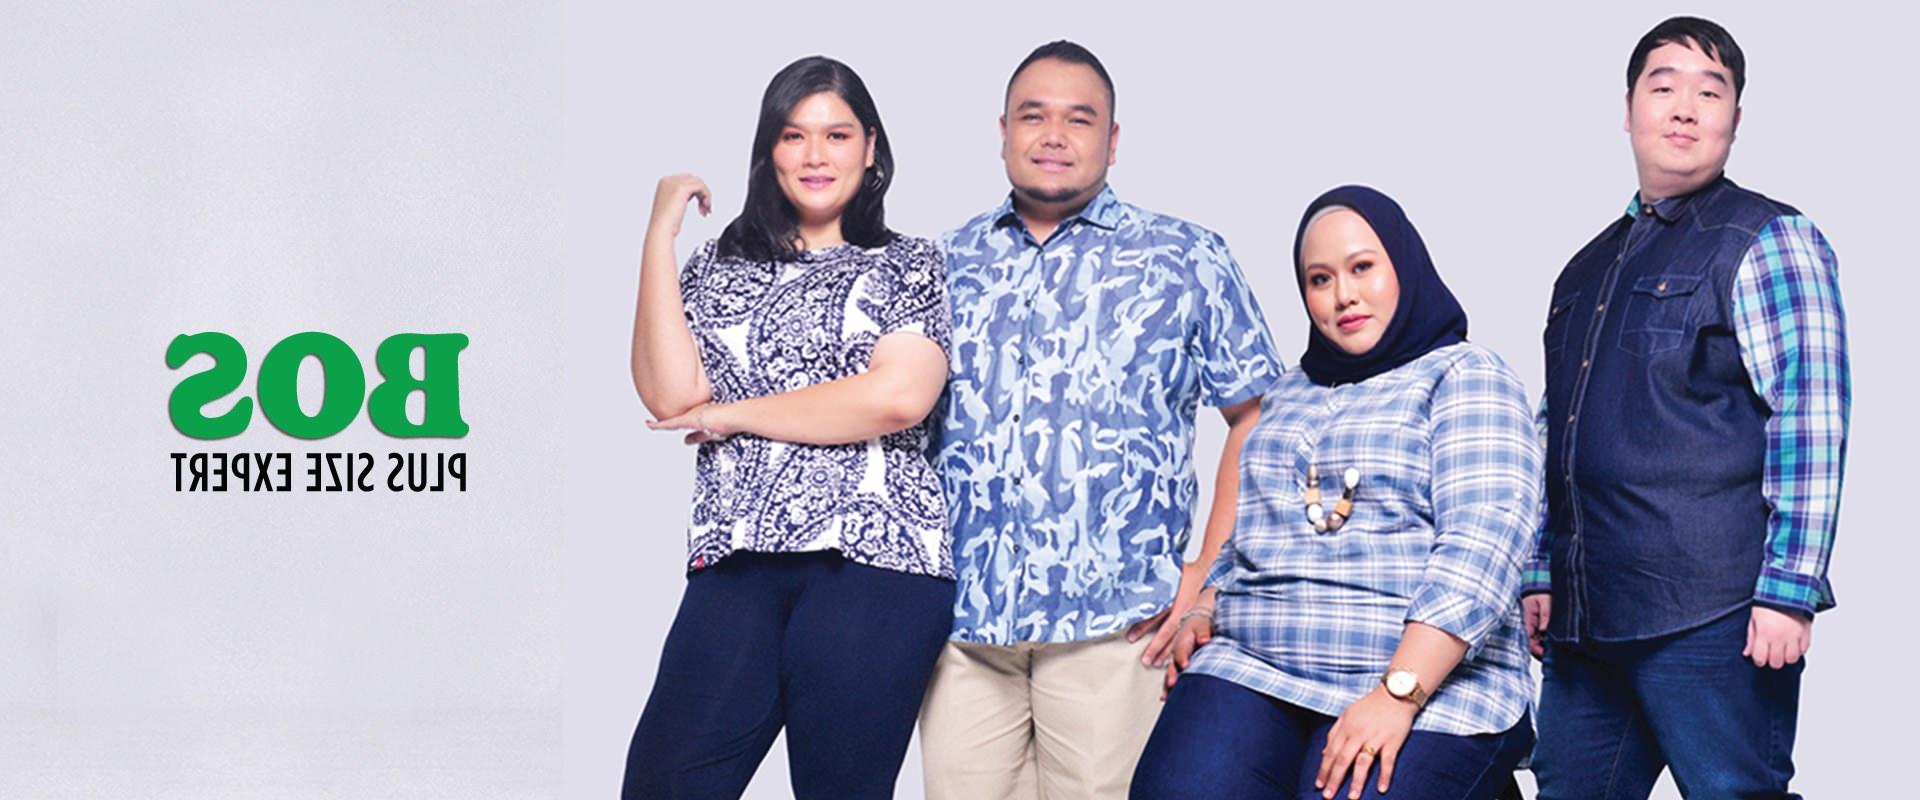 Ide Sewa Baju Pengantin Muslim Modern Xtd6 butik Bos Malaysia Big and Tall Plus Size Clothing Store